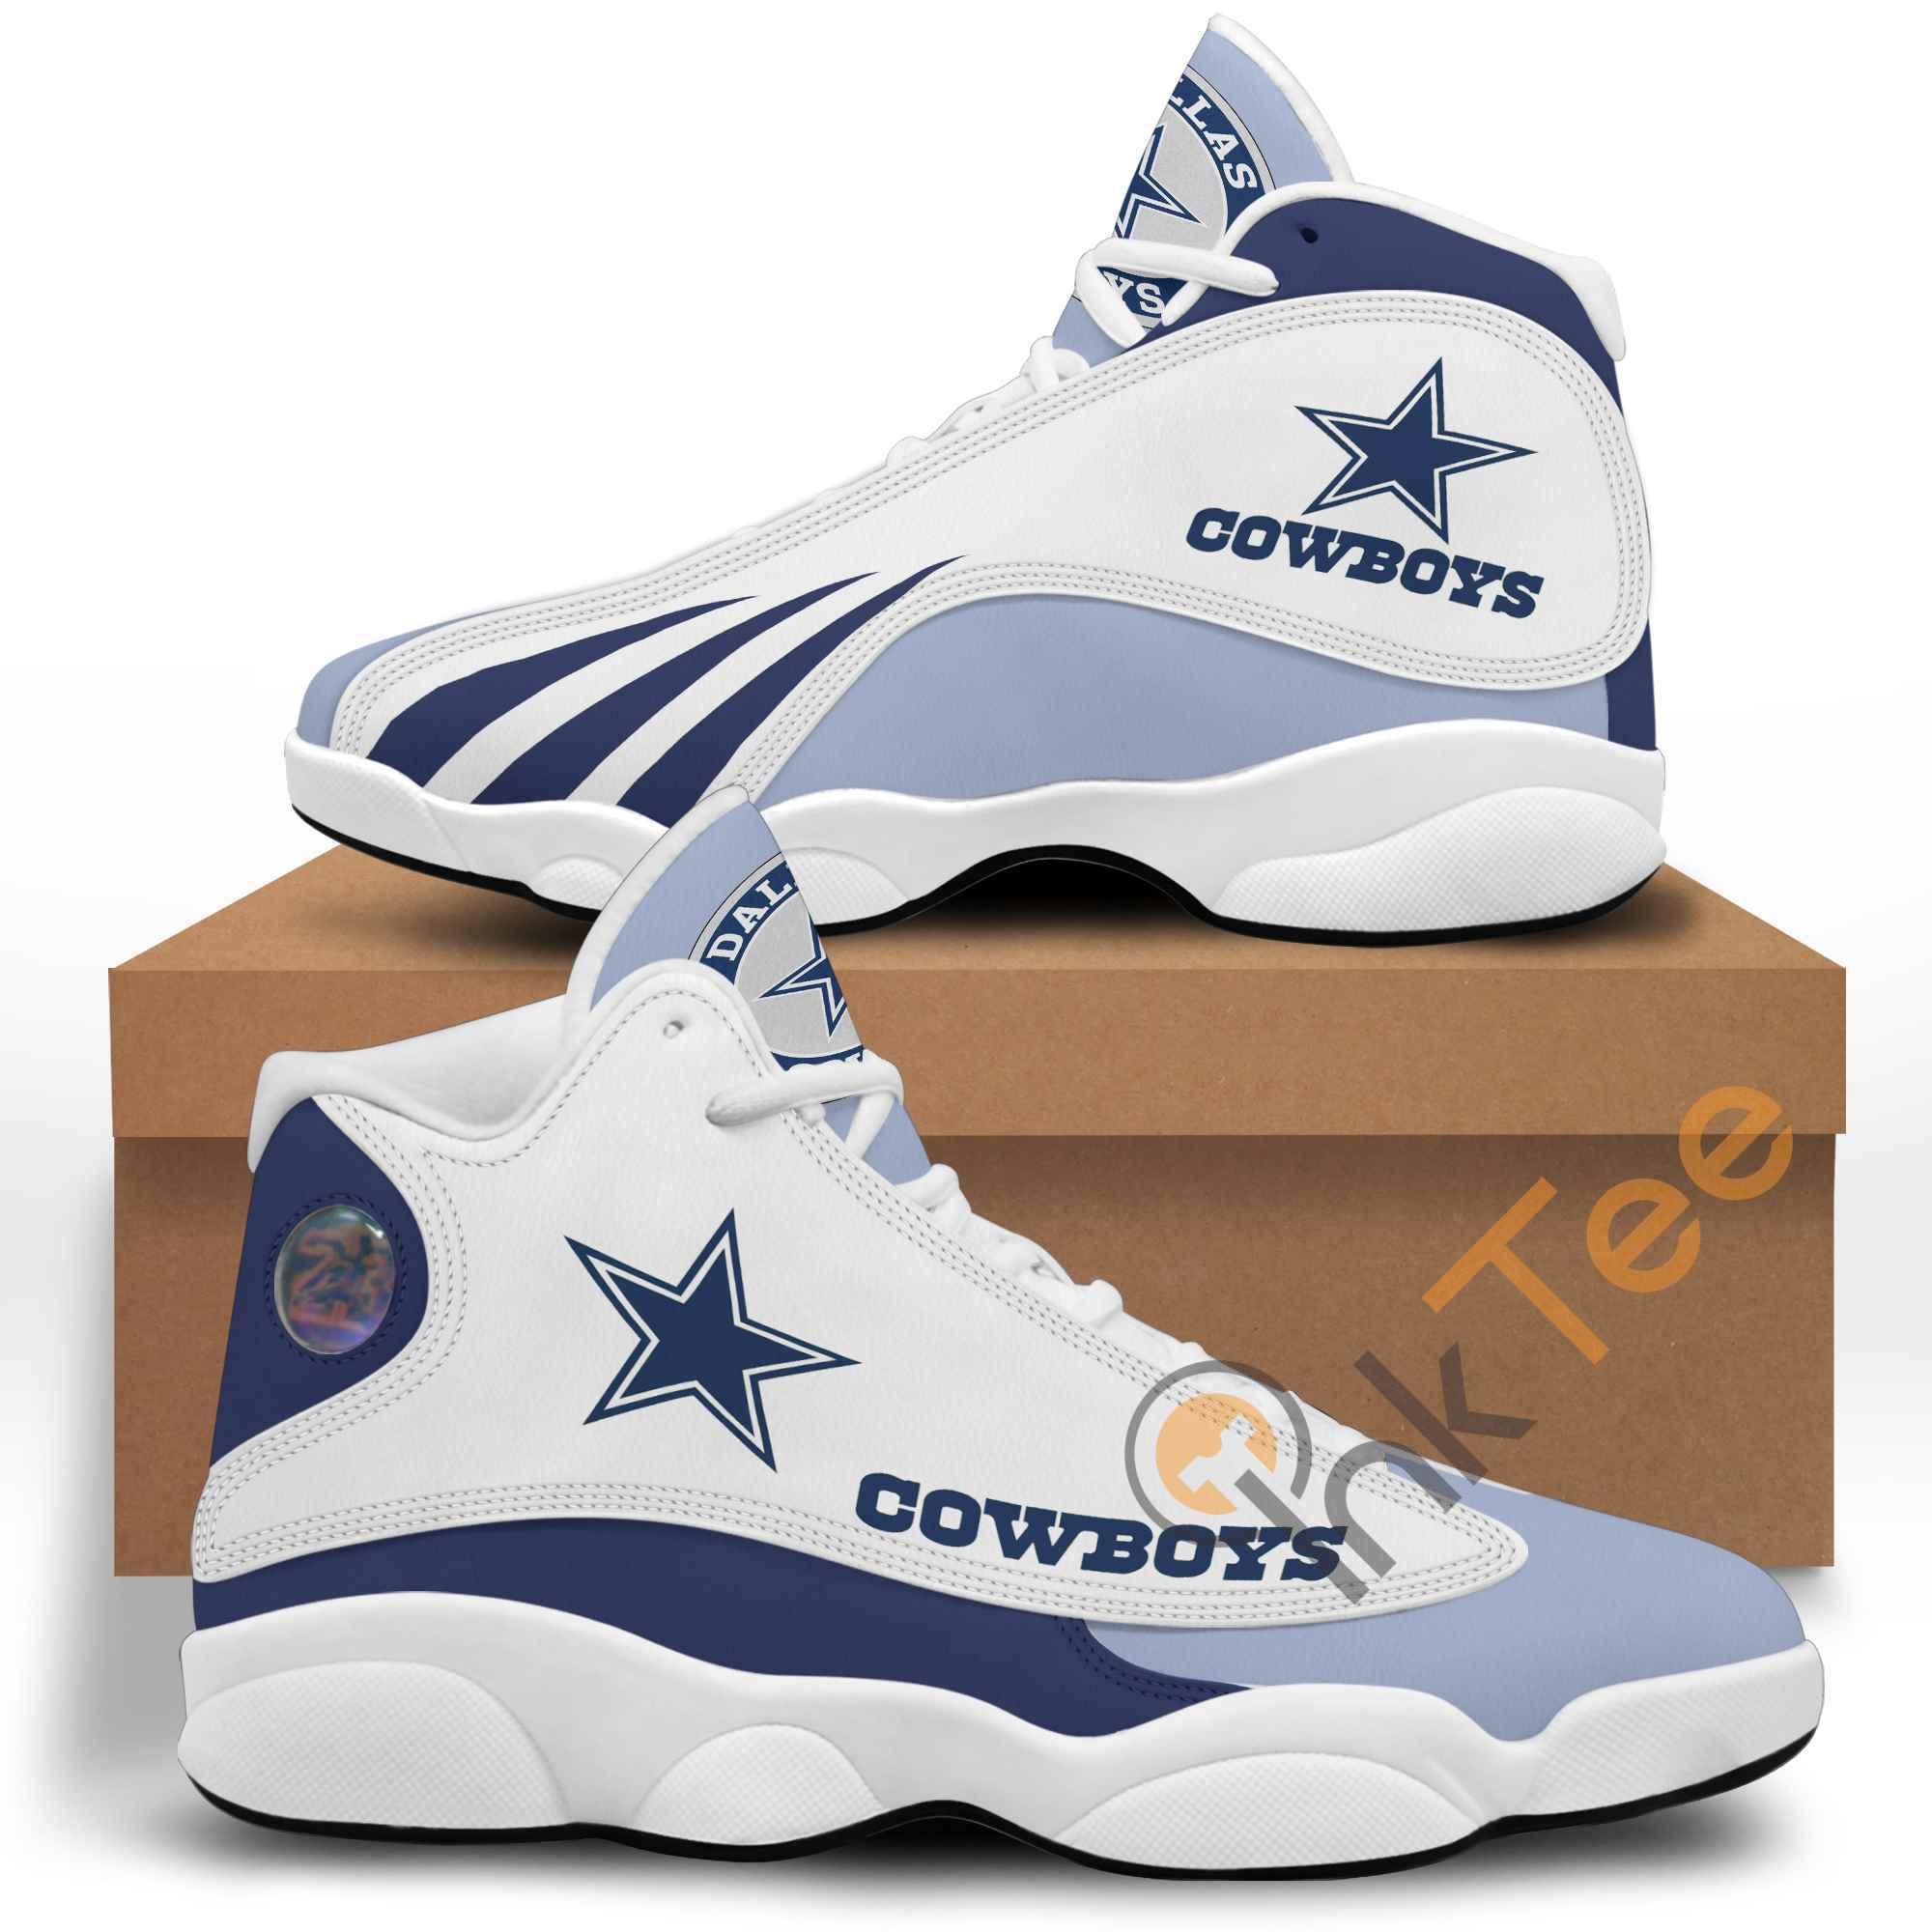 Nfl Dallas Cowboys Air Jordan 13s Customized Shoes